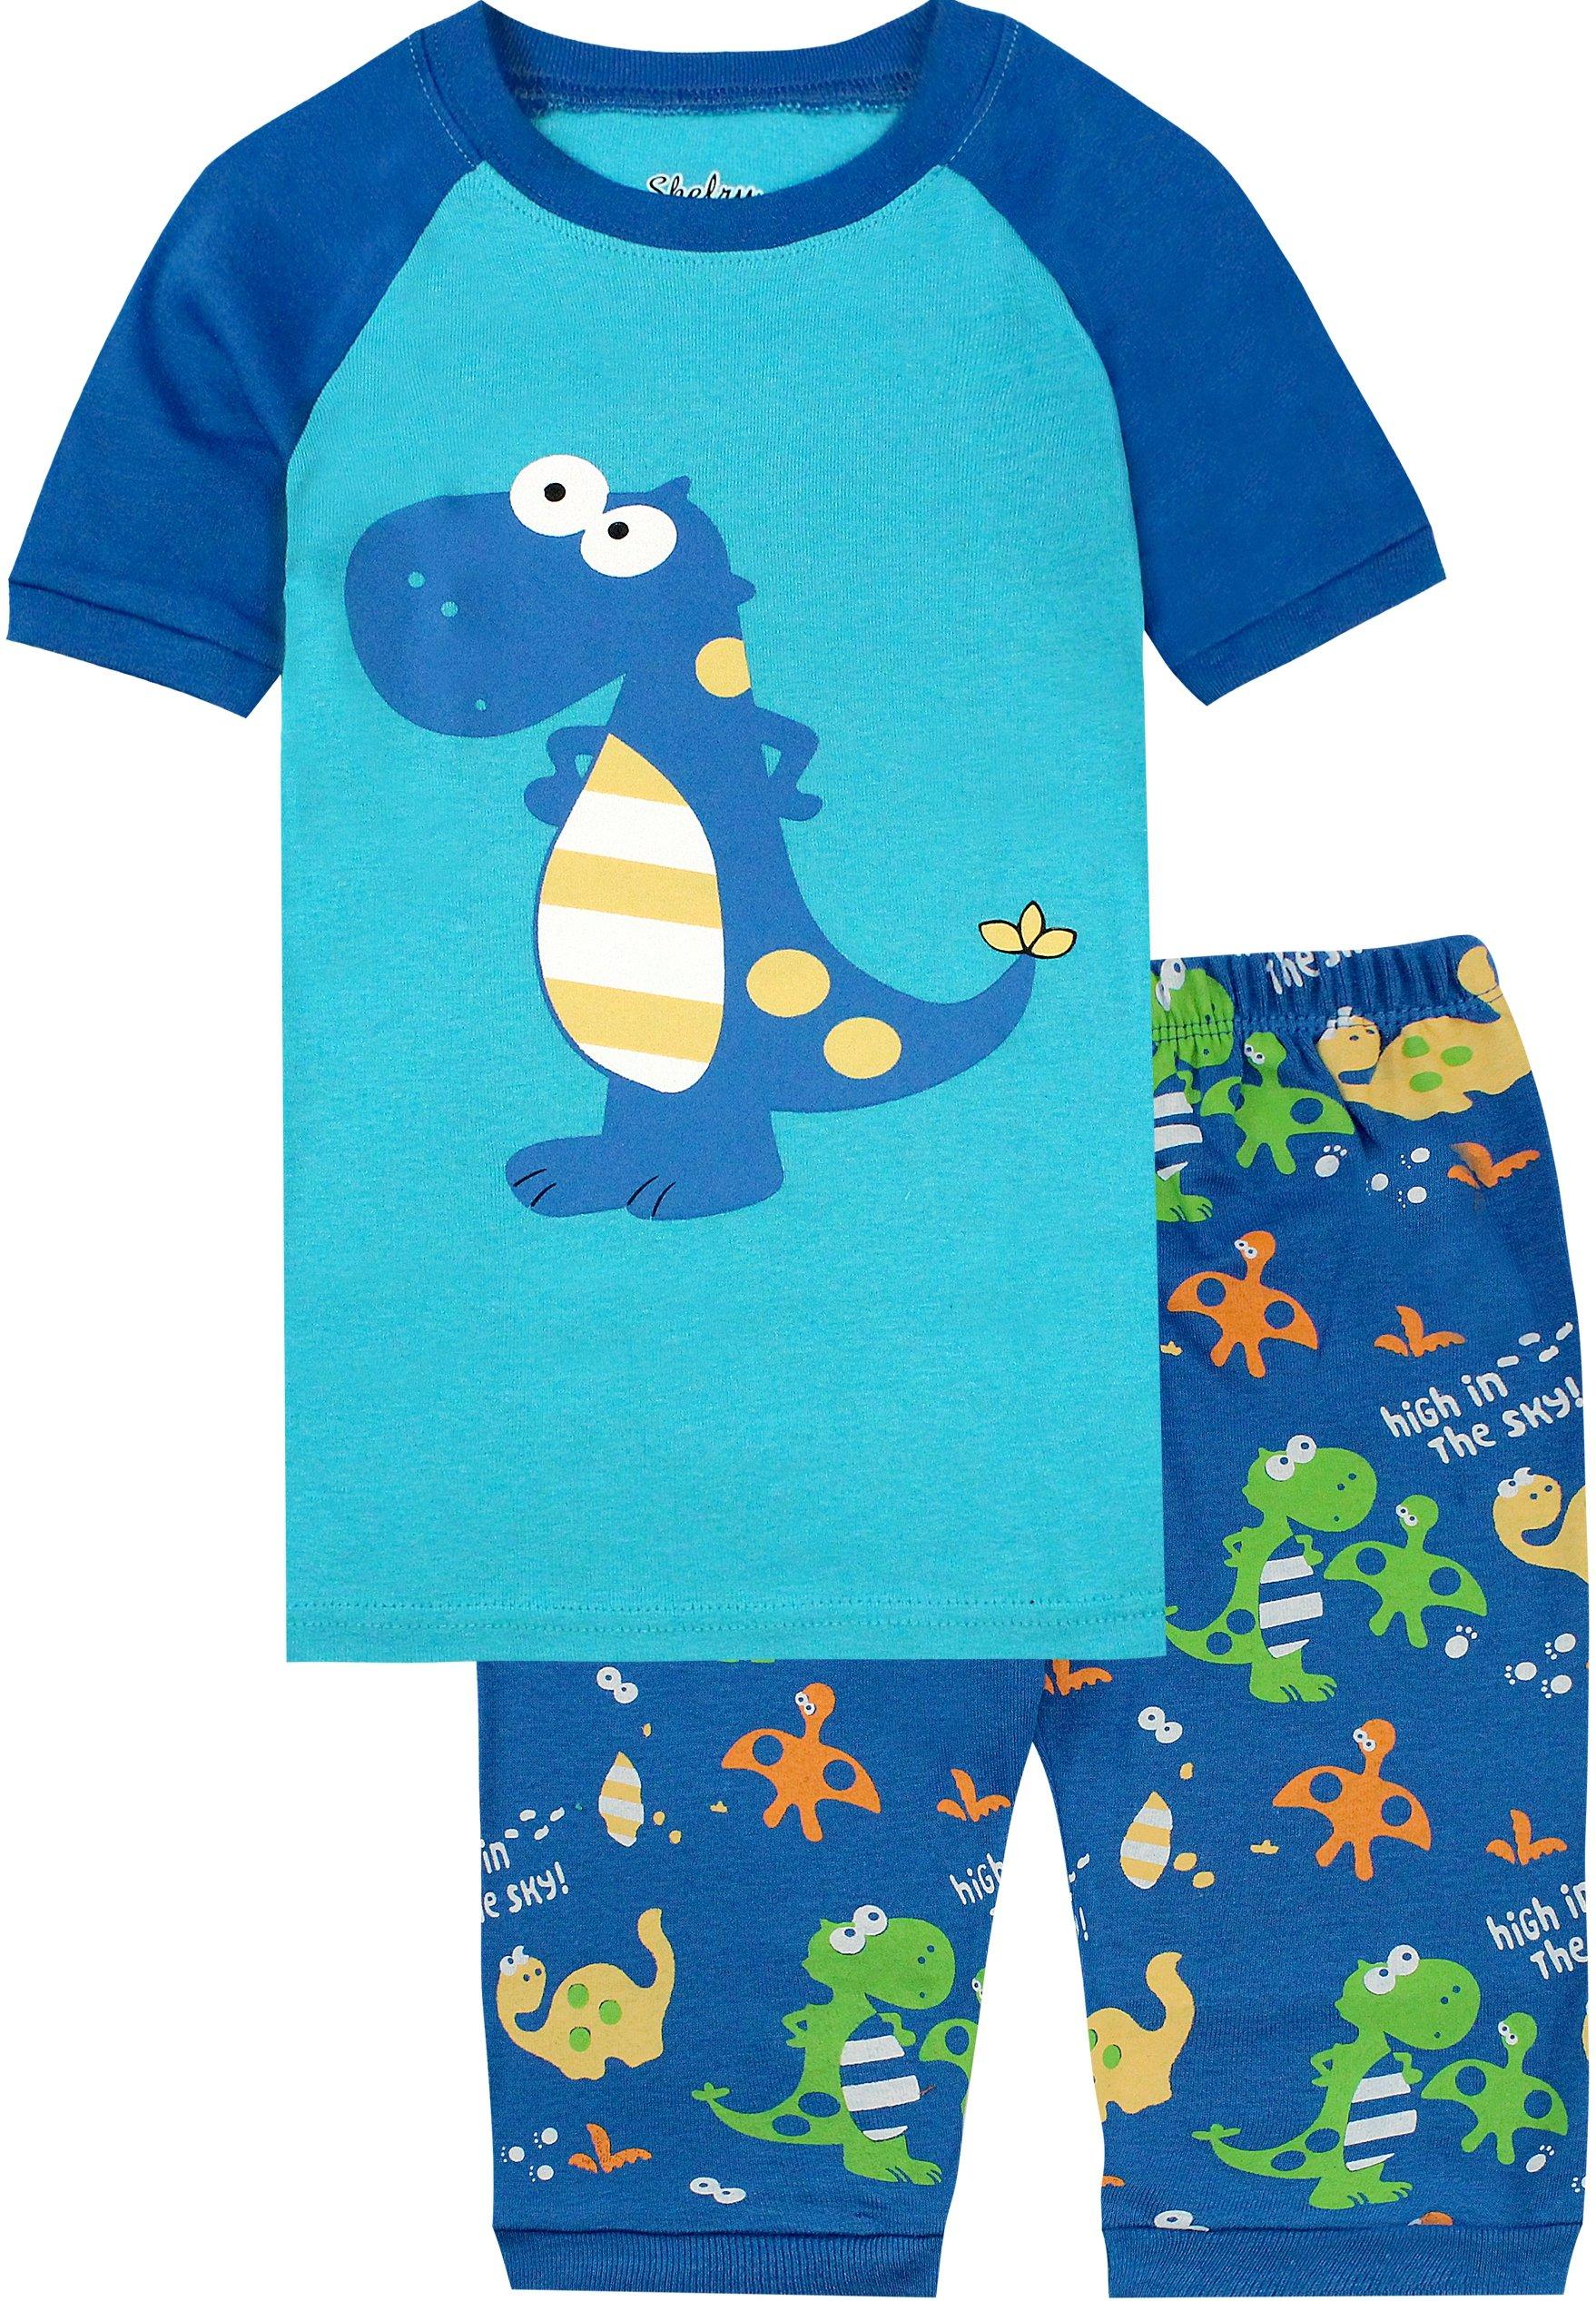 Boys Pajamas Boys Dinosaur Little Kid Shorts Set 100% Cotton Clothes Short Sleeves Sleepwear 8Y